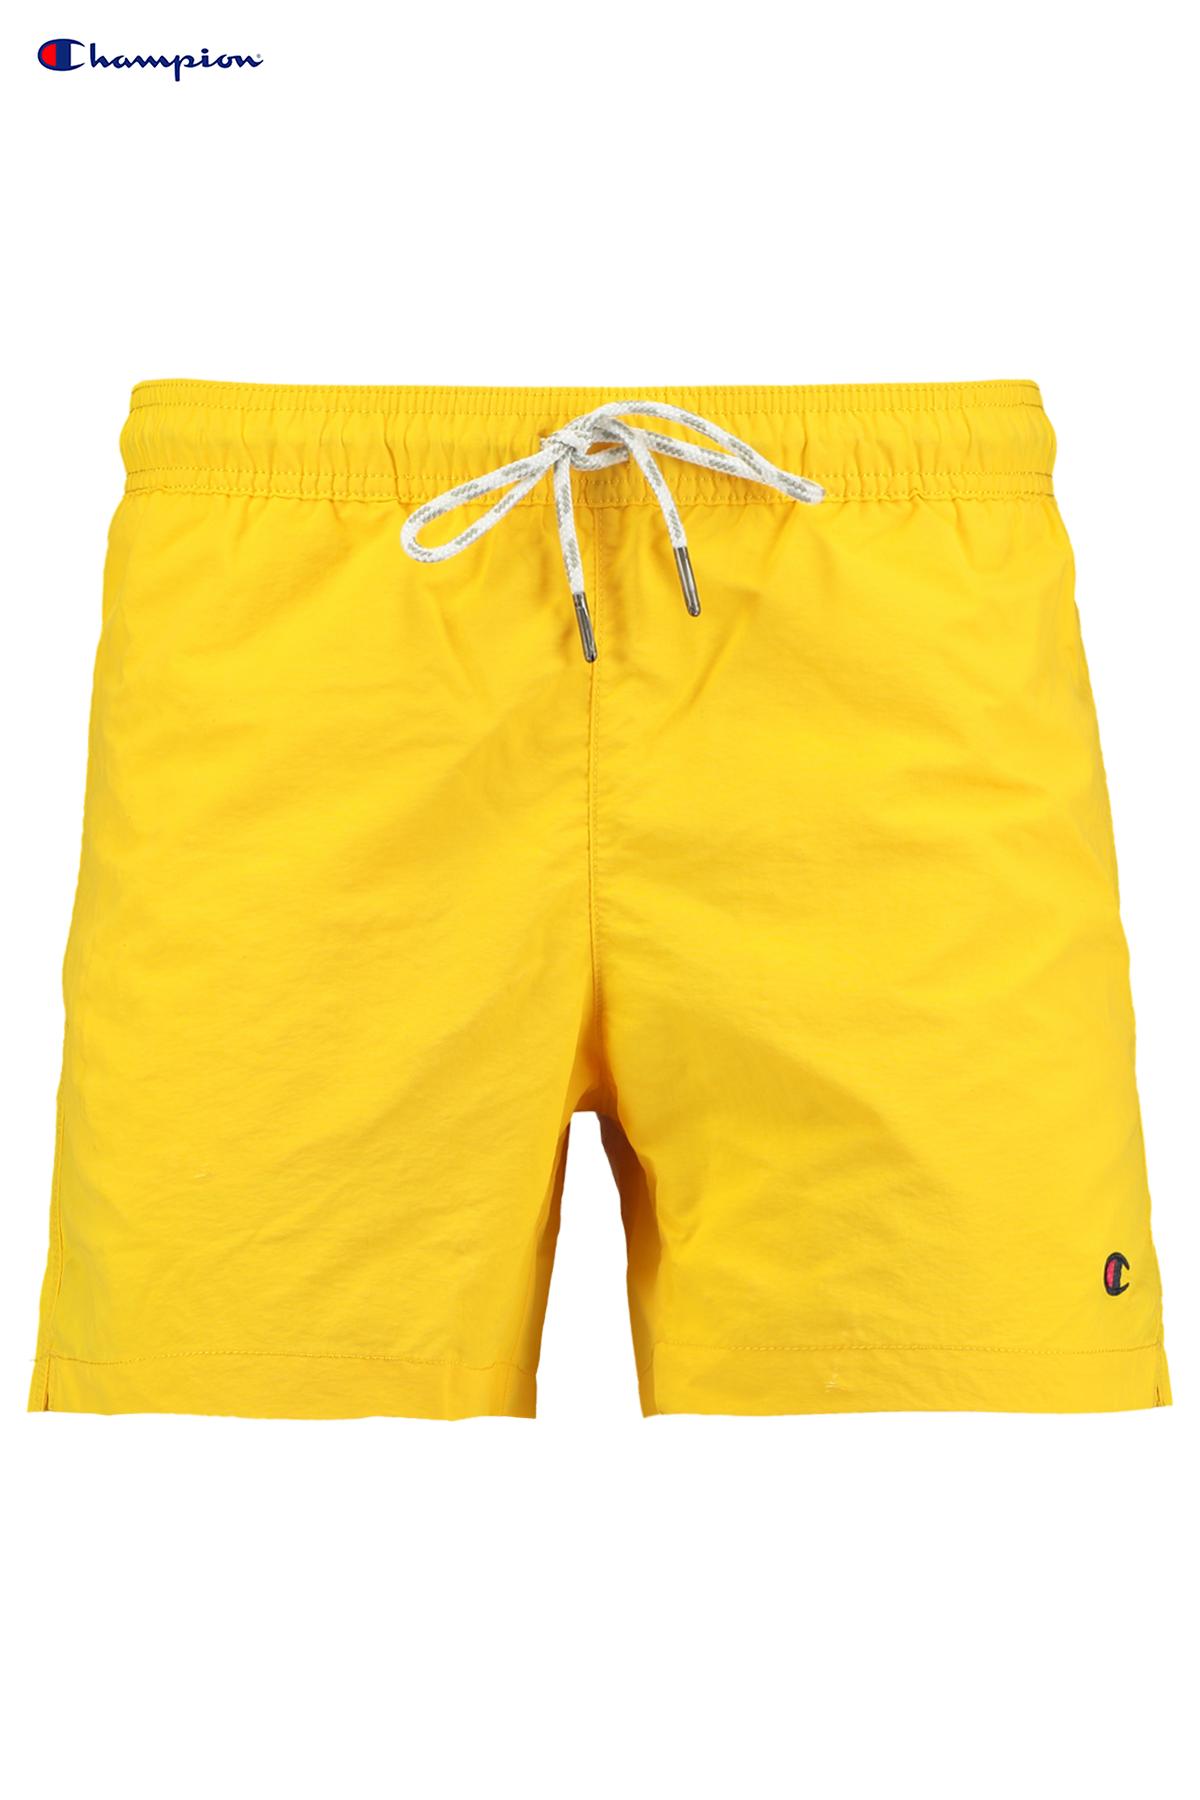 Swimming trunks Beach short